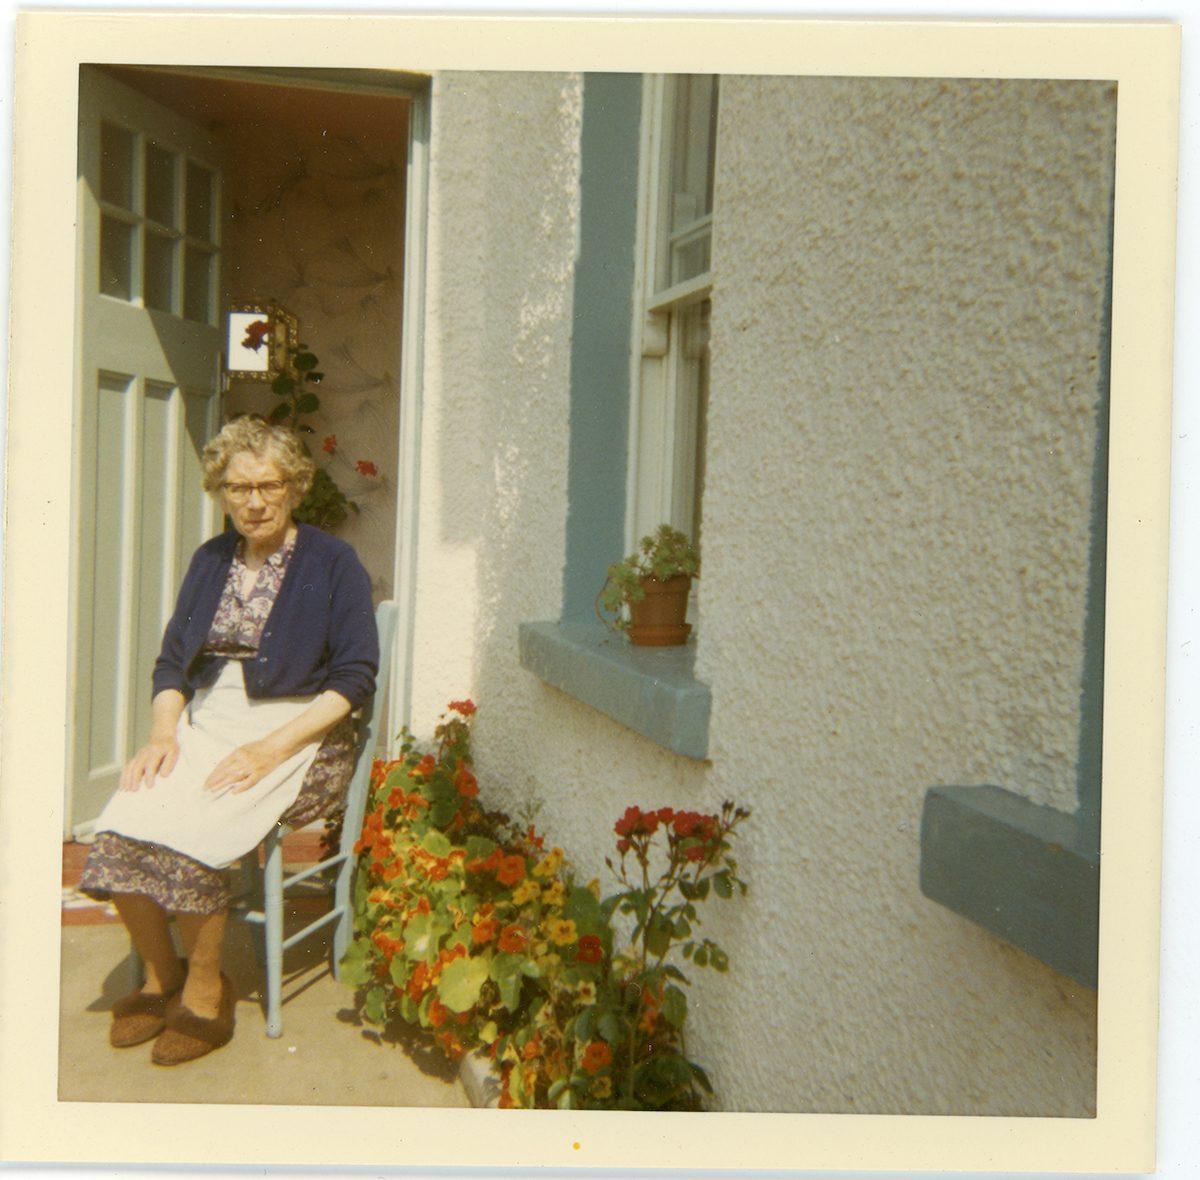 McNally // Boston & Lurgan :: Kate (Hendron) McConville, Derrycor, Craigavon, N.Ireland, August, 1969